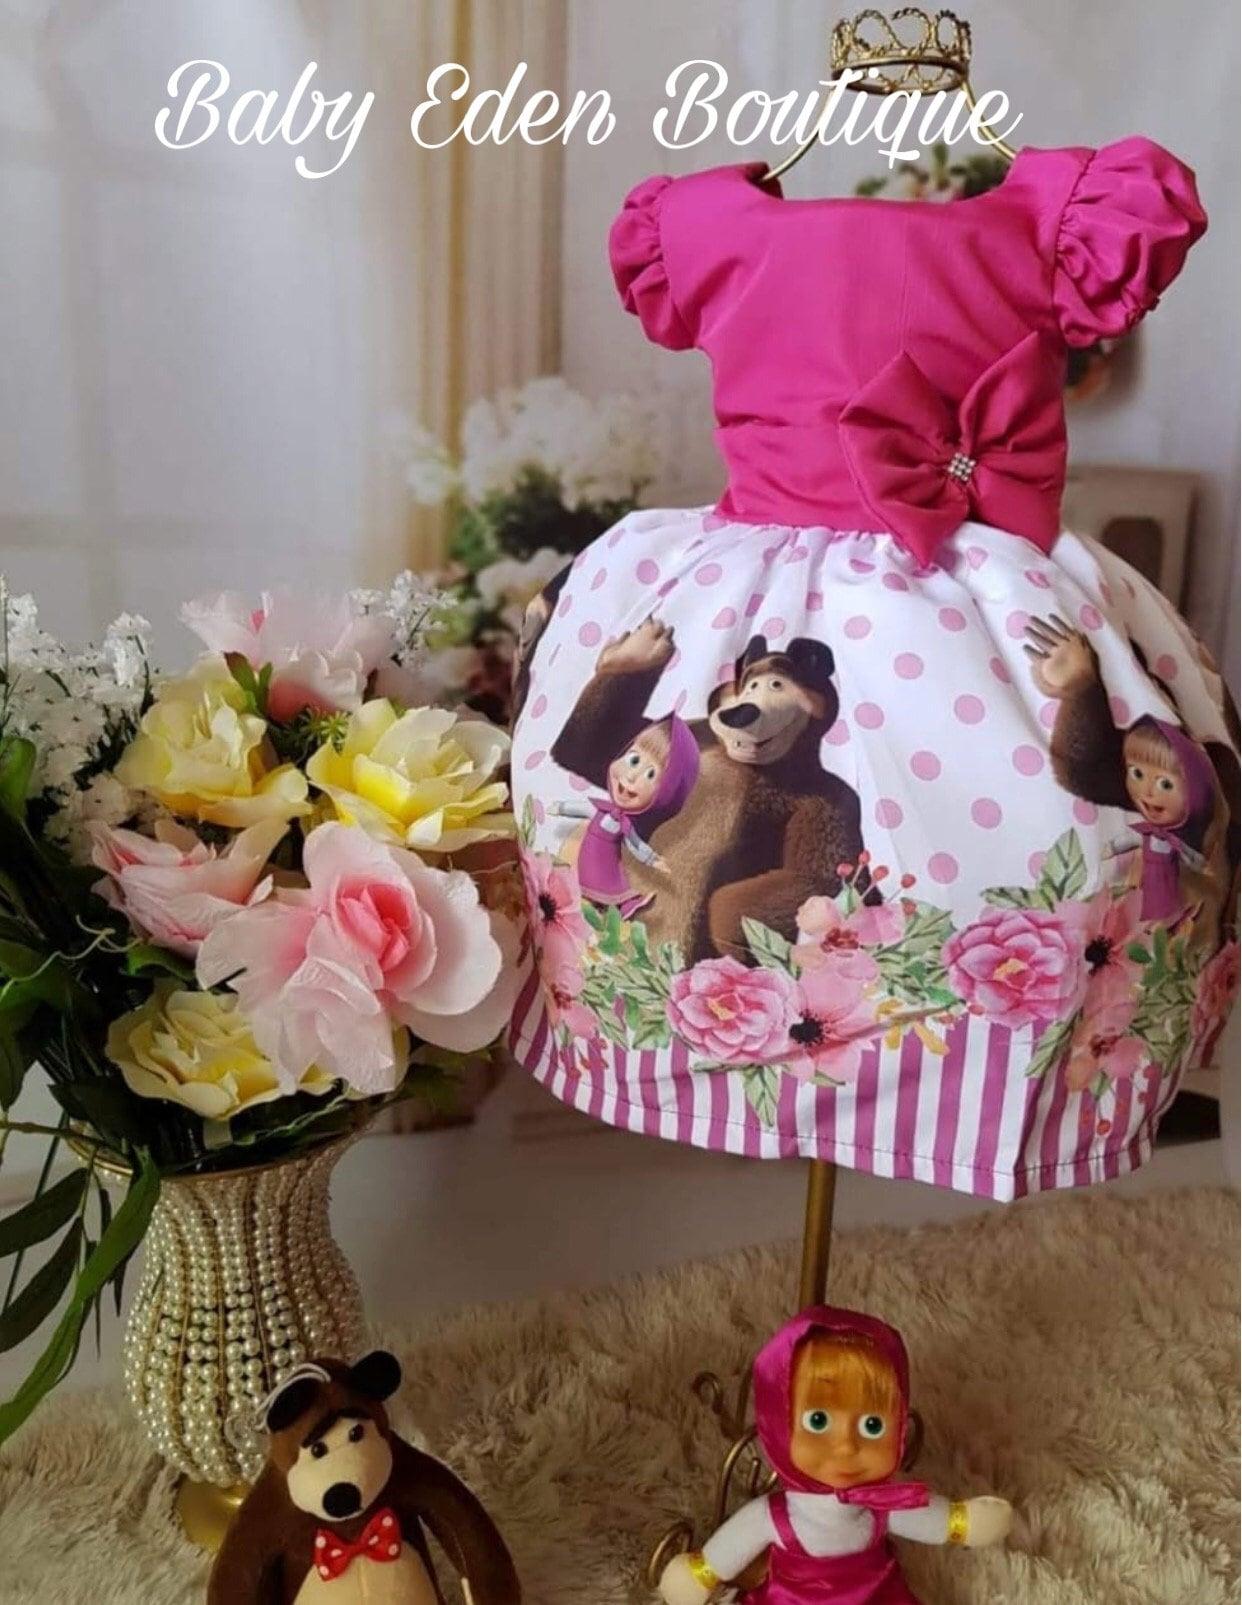 5a8d52f3de12e Free shipping /Masha and bear dress/birthday dress masha/special  dress/masha dress/theme birthday dress masha/masha /birthday dress